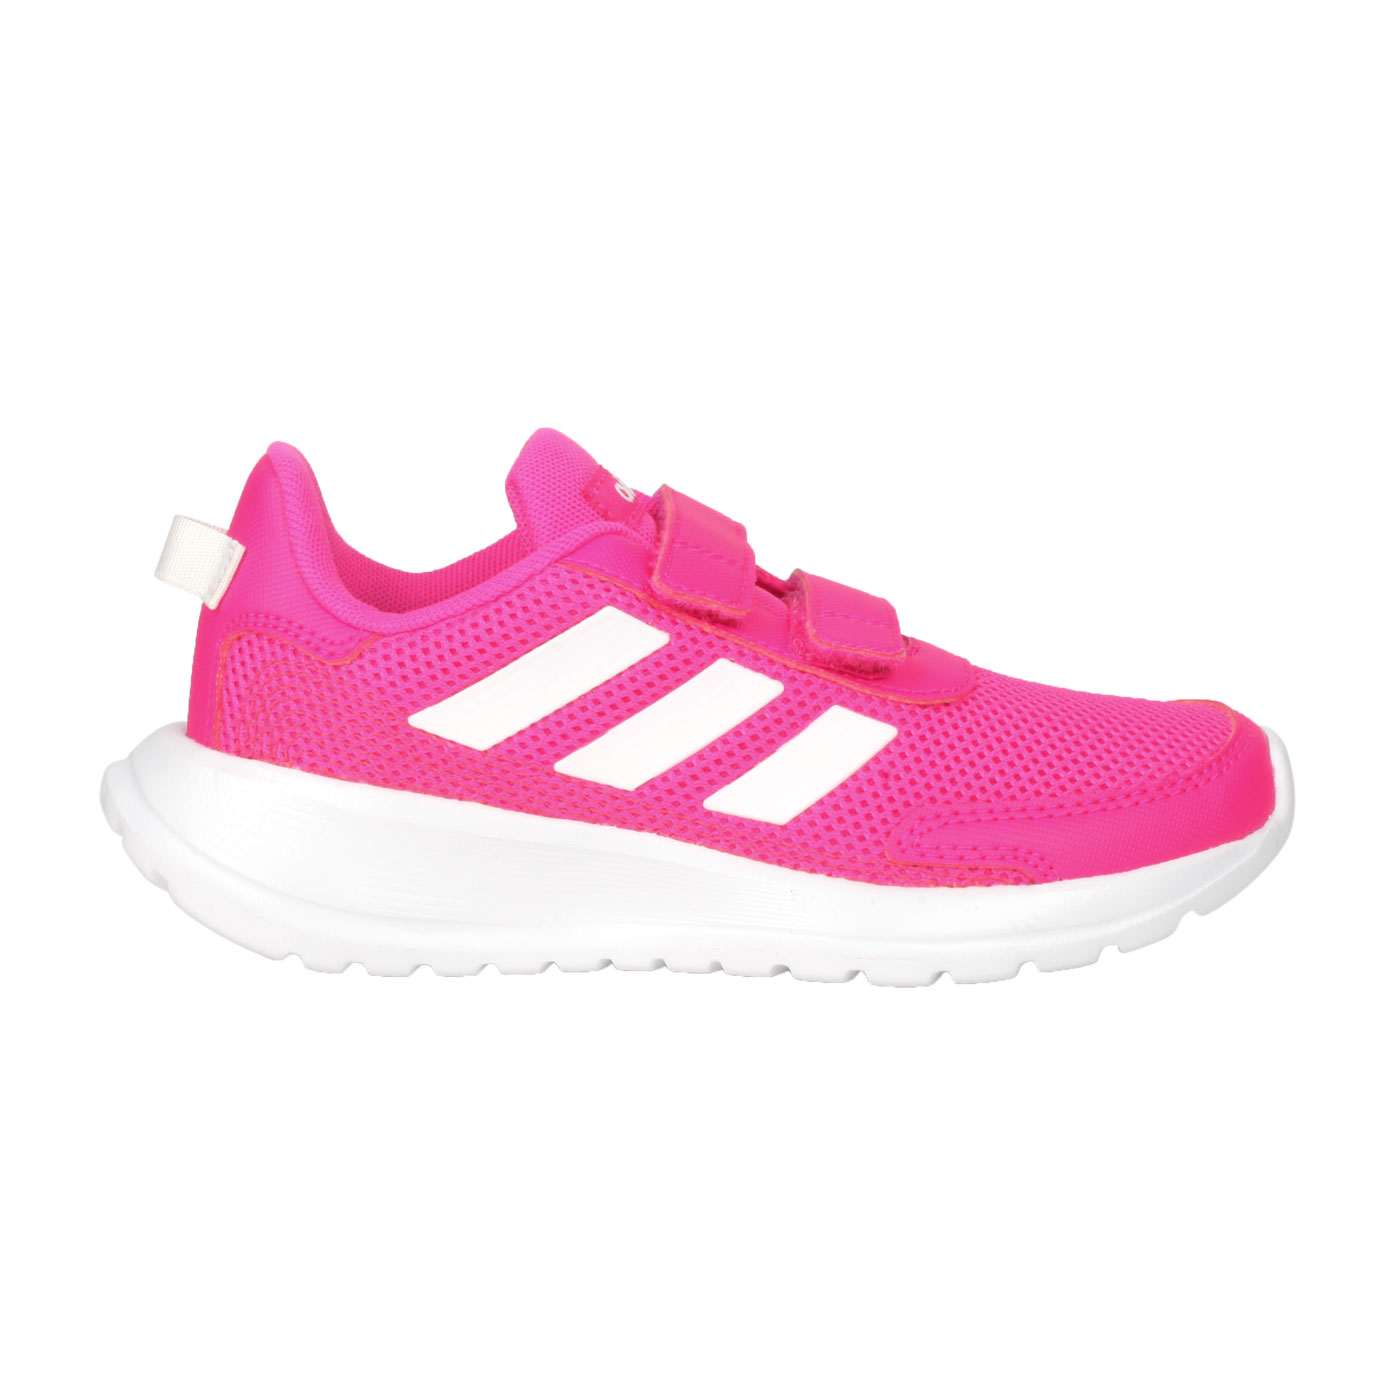 ADIDAS 中童慢跑鞋  @TENSAUR RUN C@EG4145 - 亮桃紅白